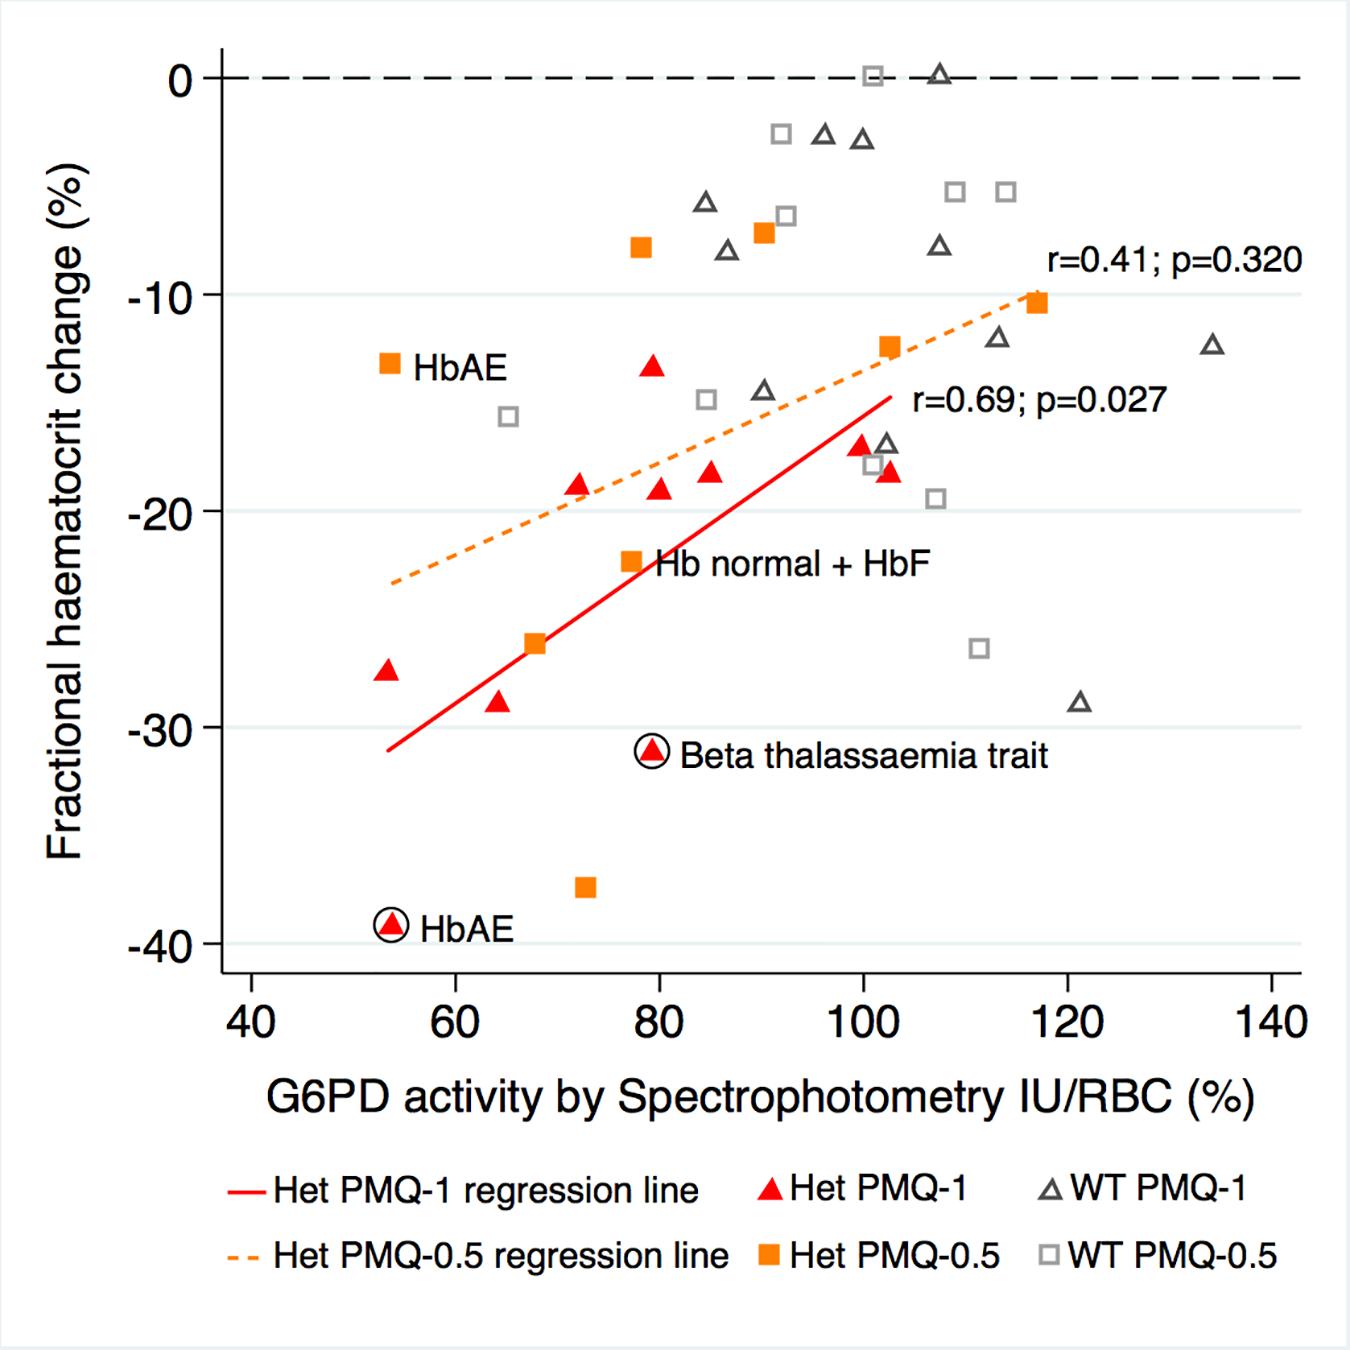 Correlation between maximum individual fractional haematocrit reduction and mean G6PD activity (IU/RBC)*.